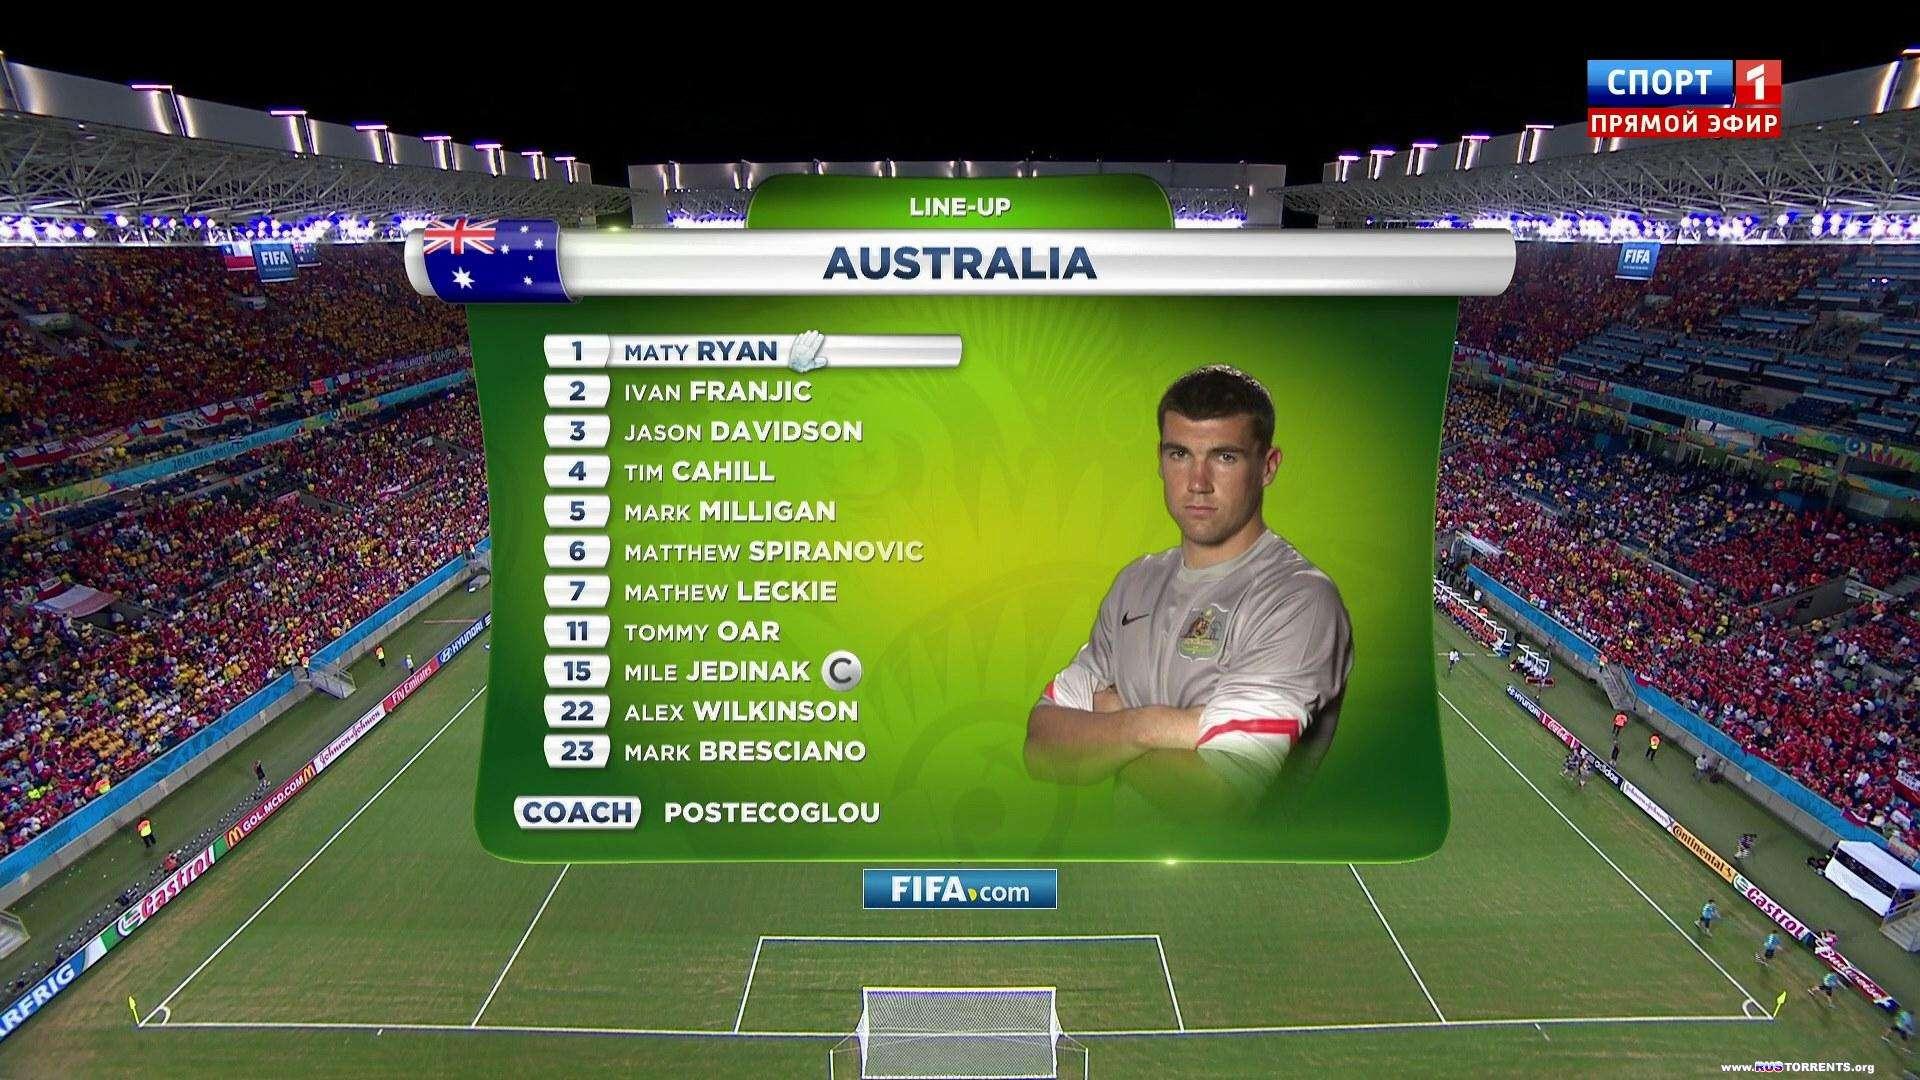 Футбол. Чемпионат Мира 2014. Группа B. 1-тур. Чили - Австралия | HDTV 1080i